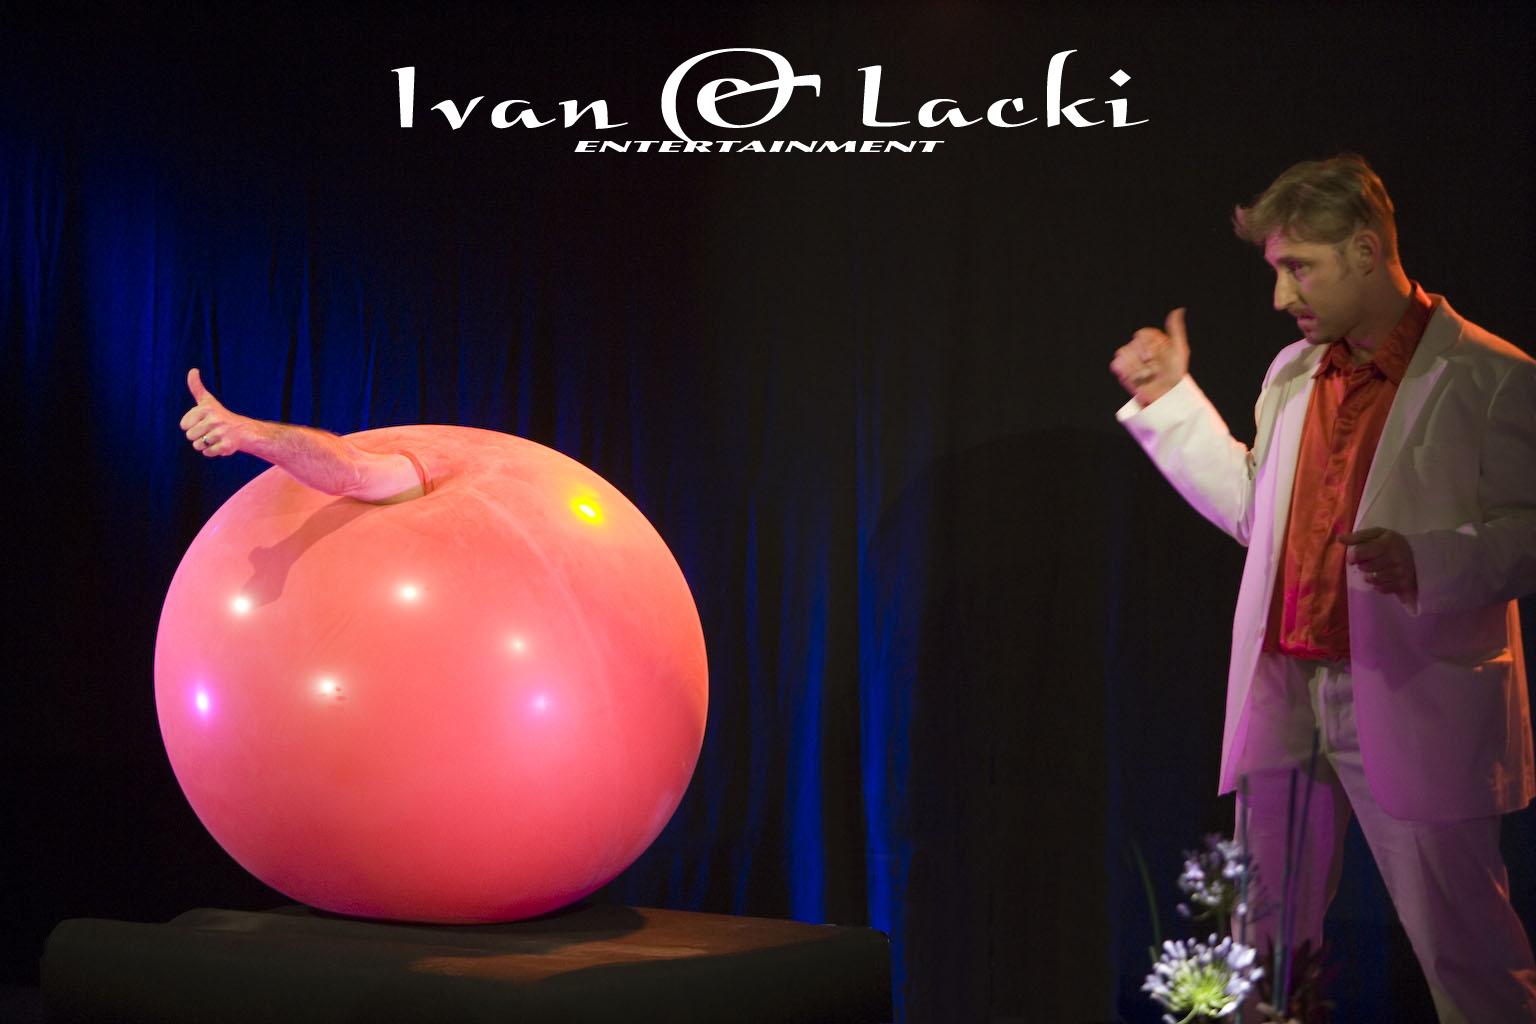 Ivan_Lacki - Ballongmannen